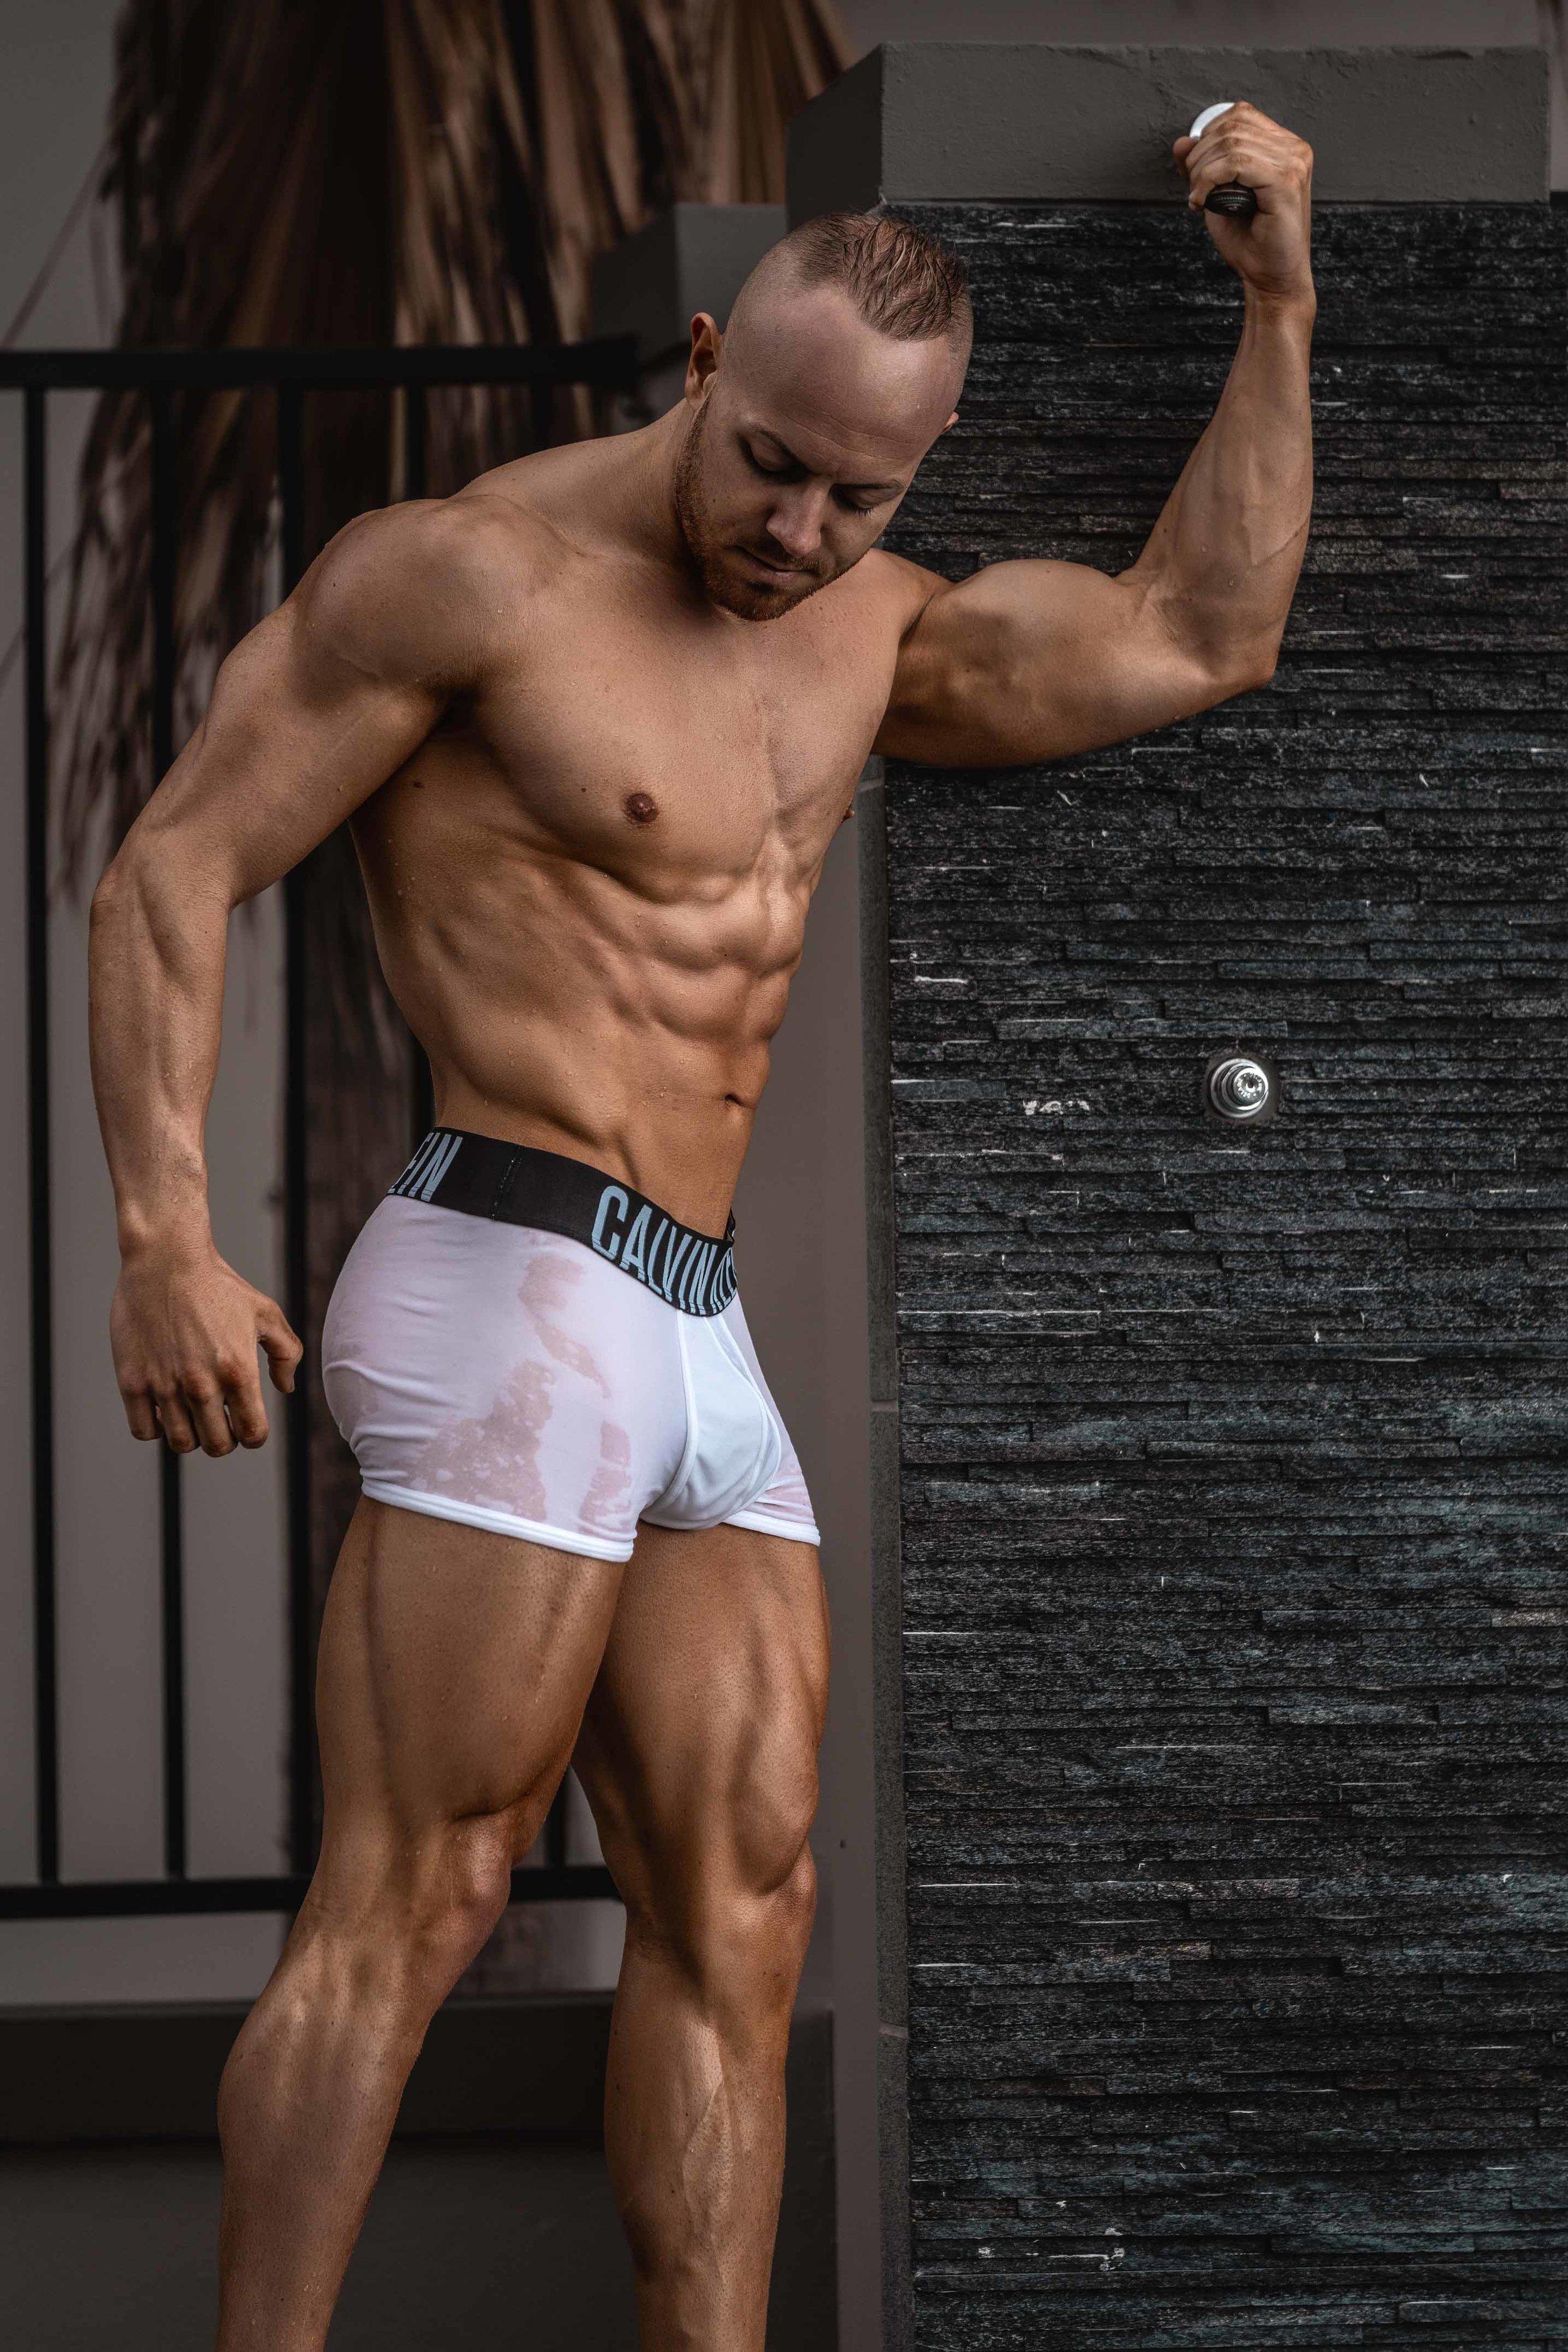 hot aussie men for hire topless waitering butler work in gold coast